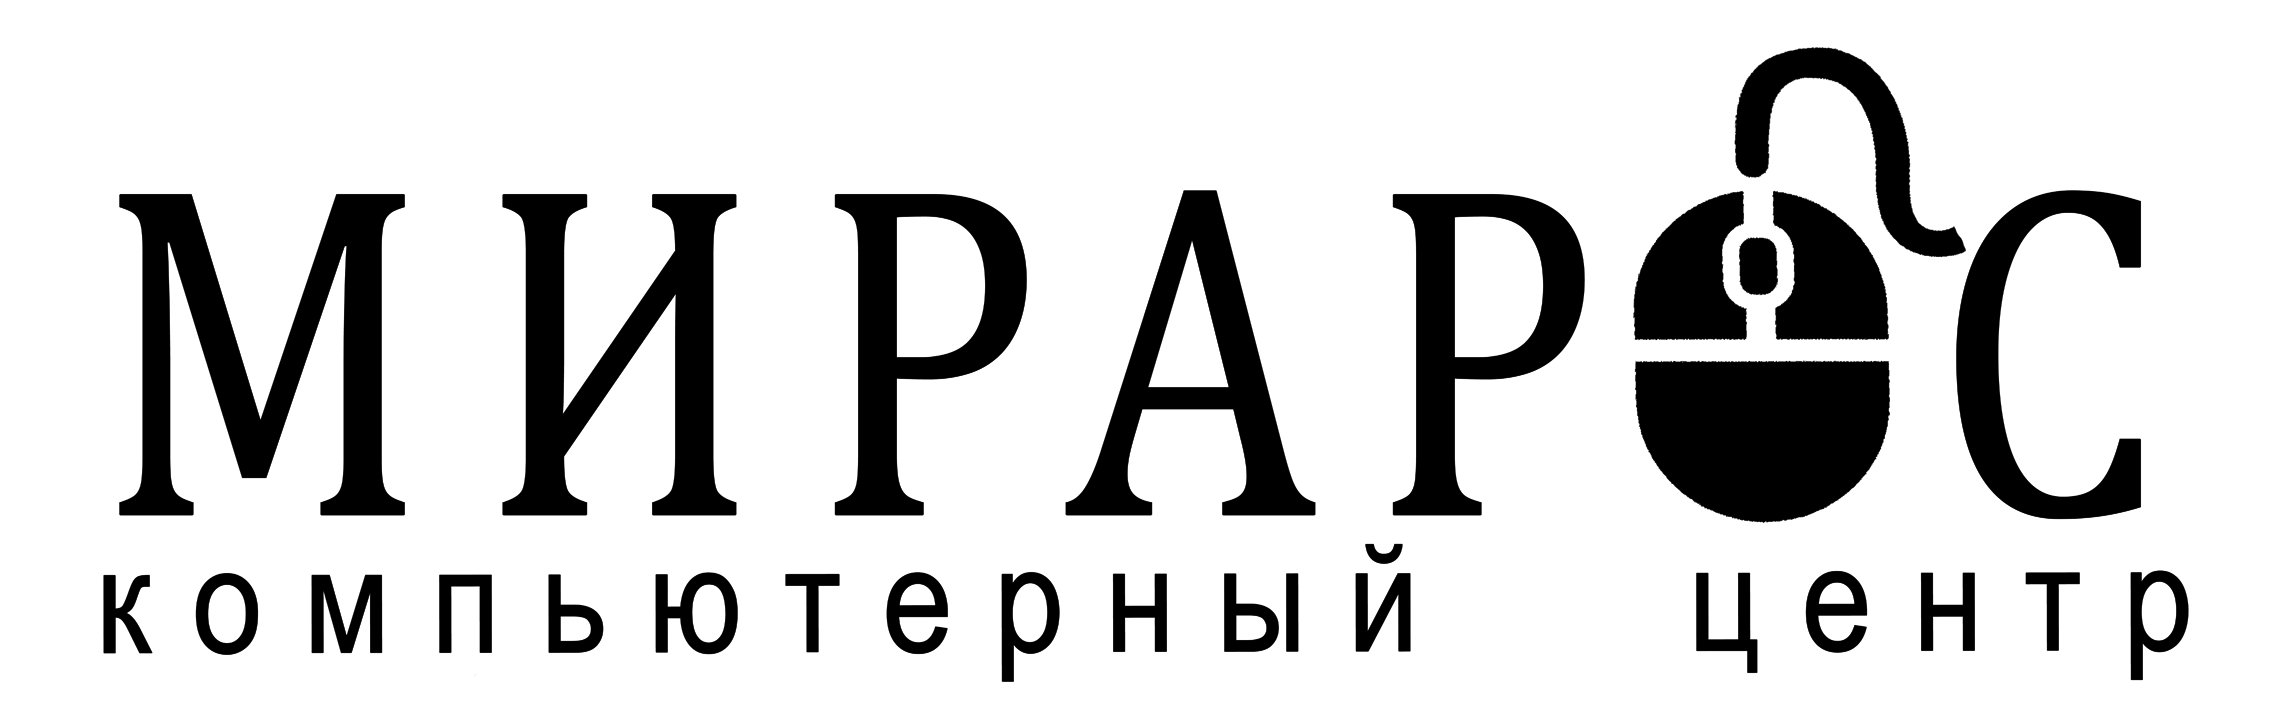 мирарос лого.jpg